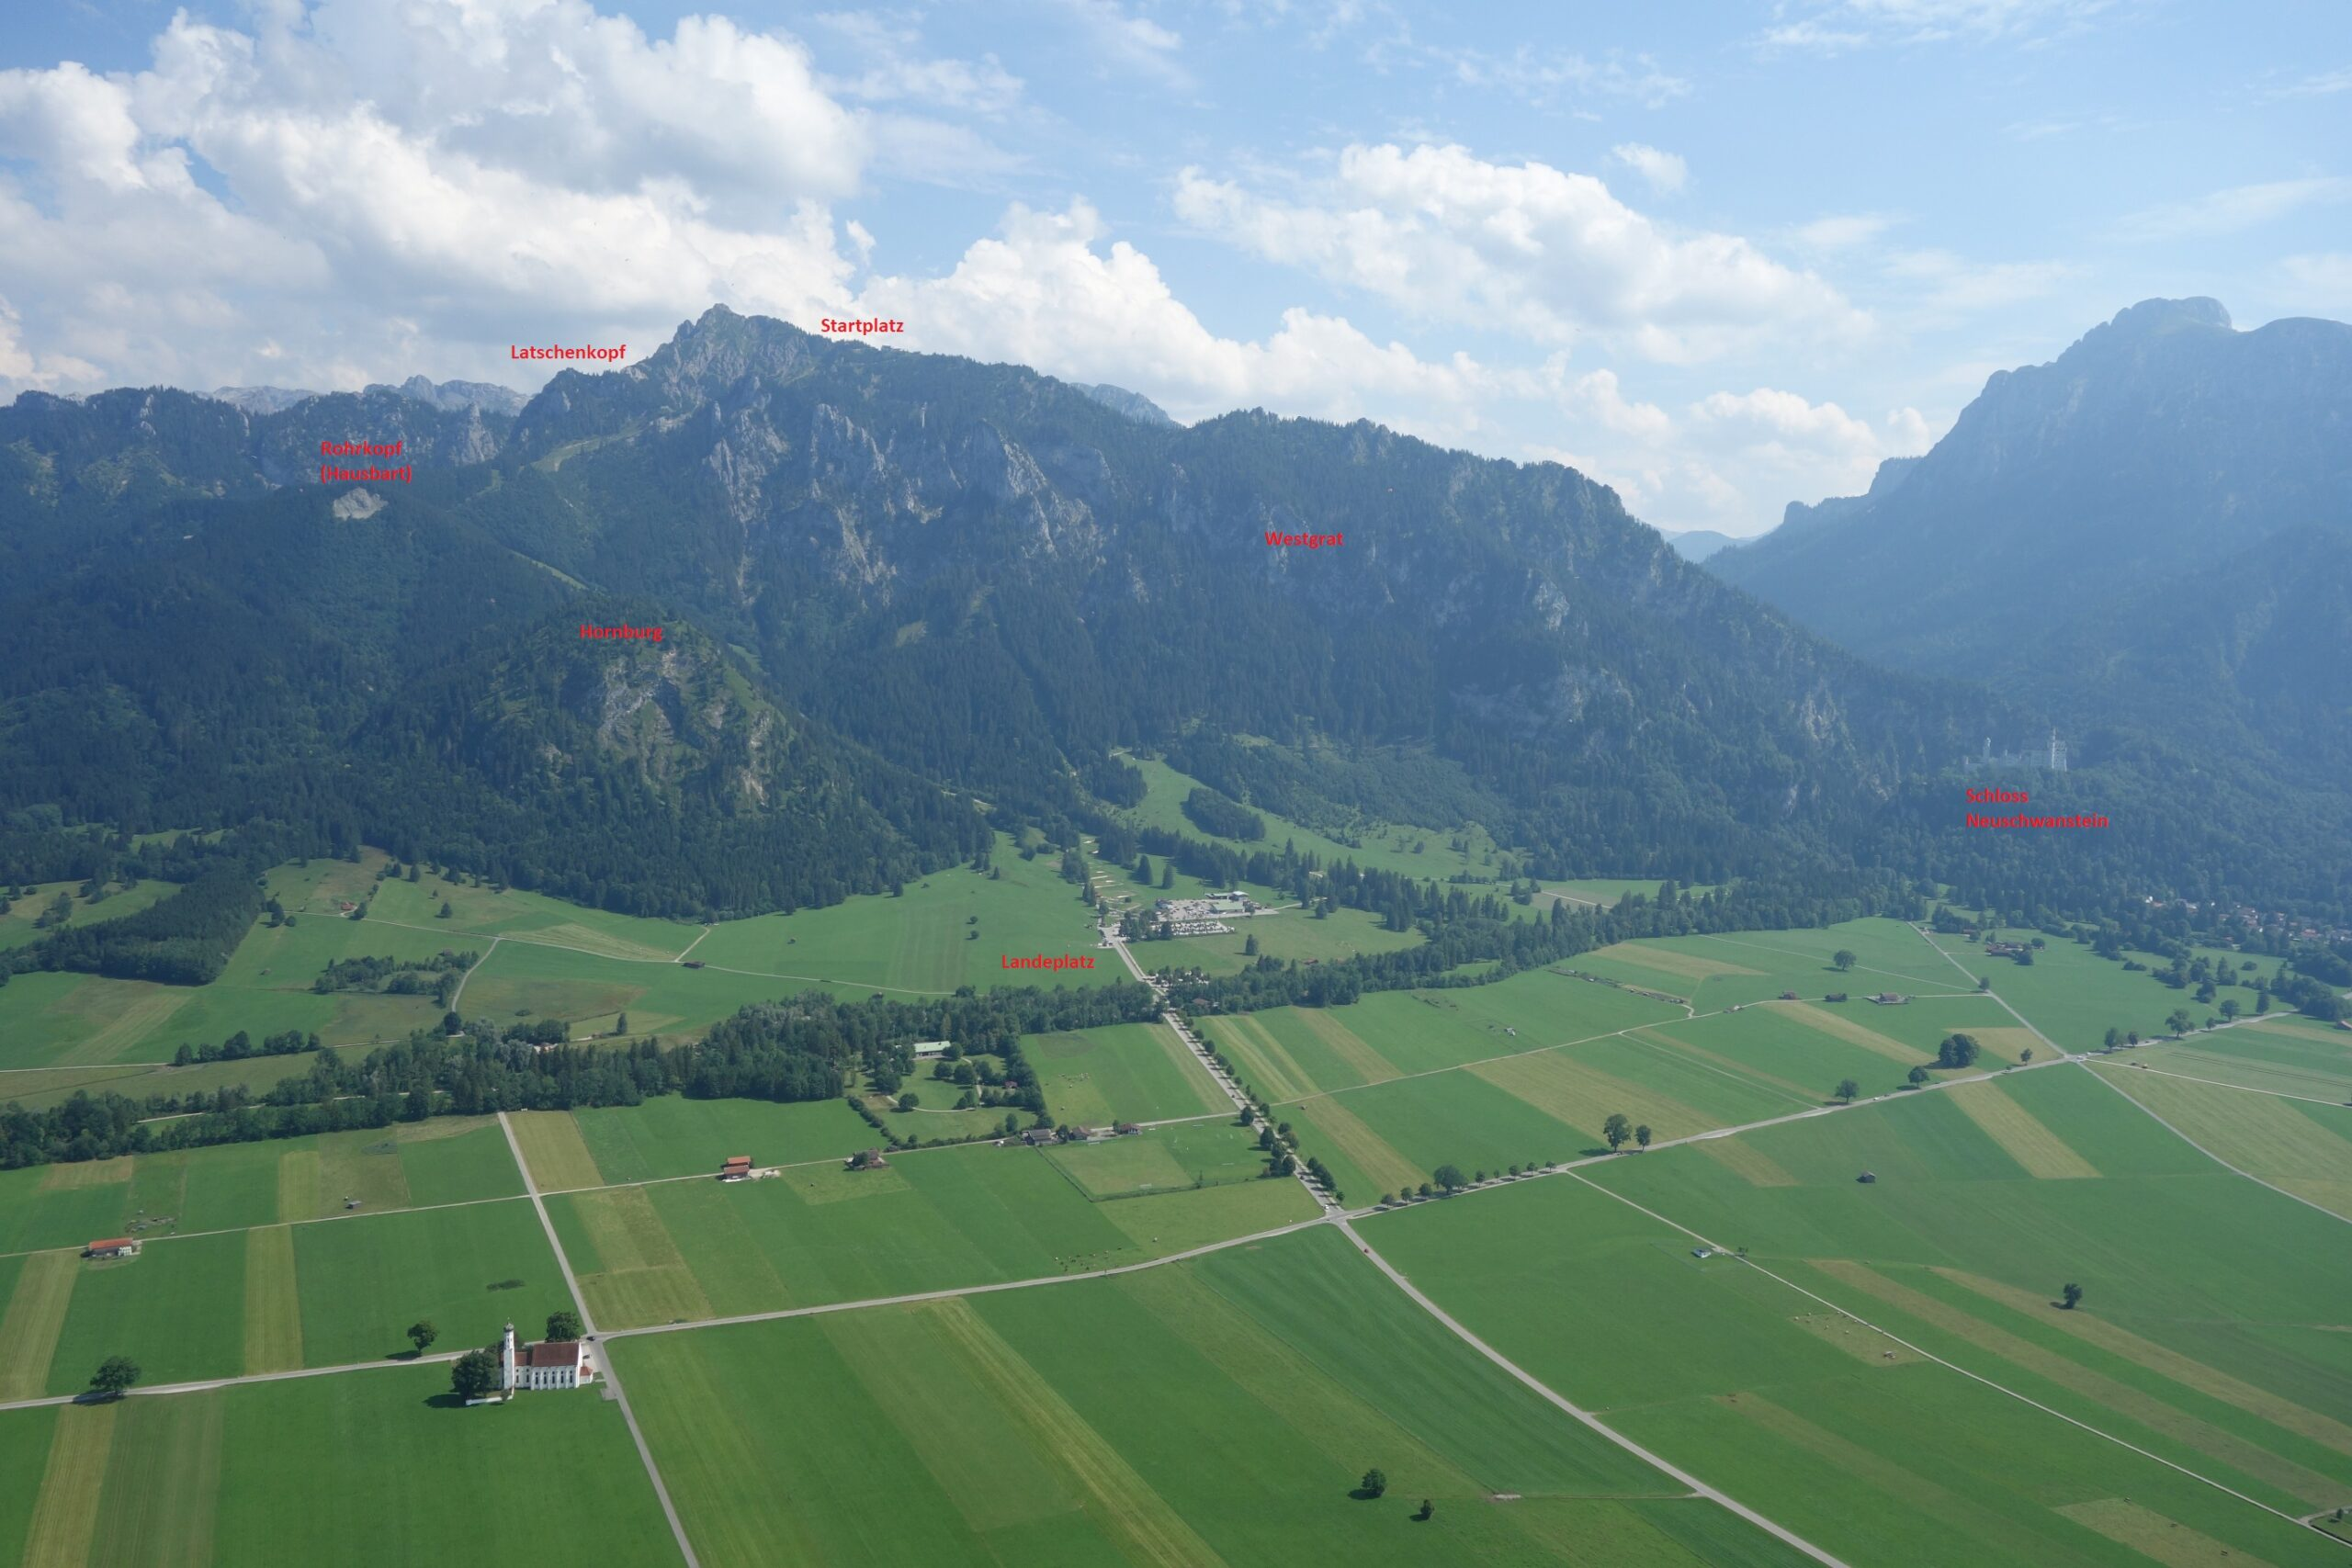 Fluggebiet Tegelberg